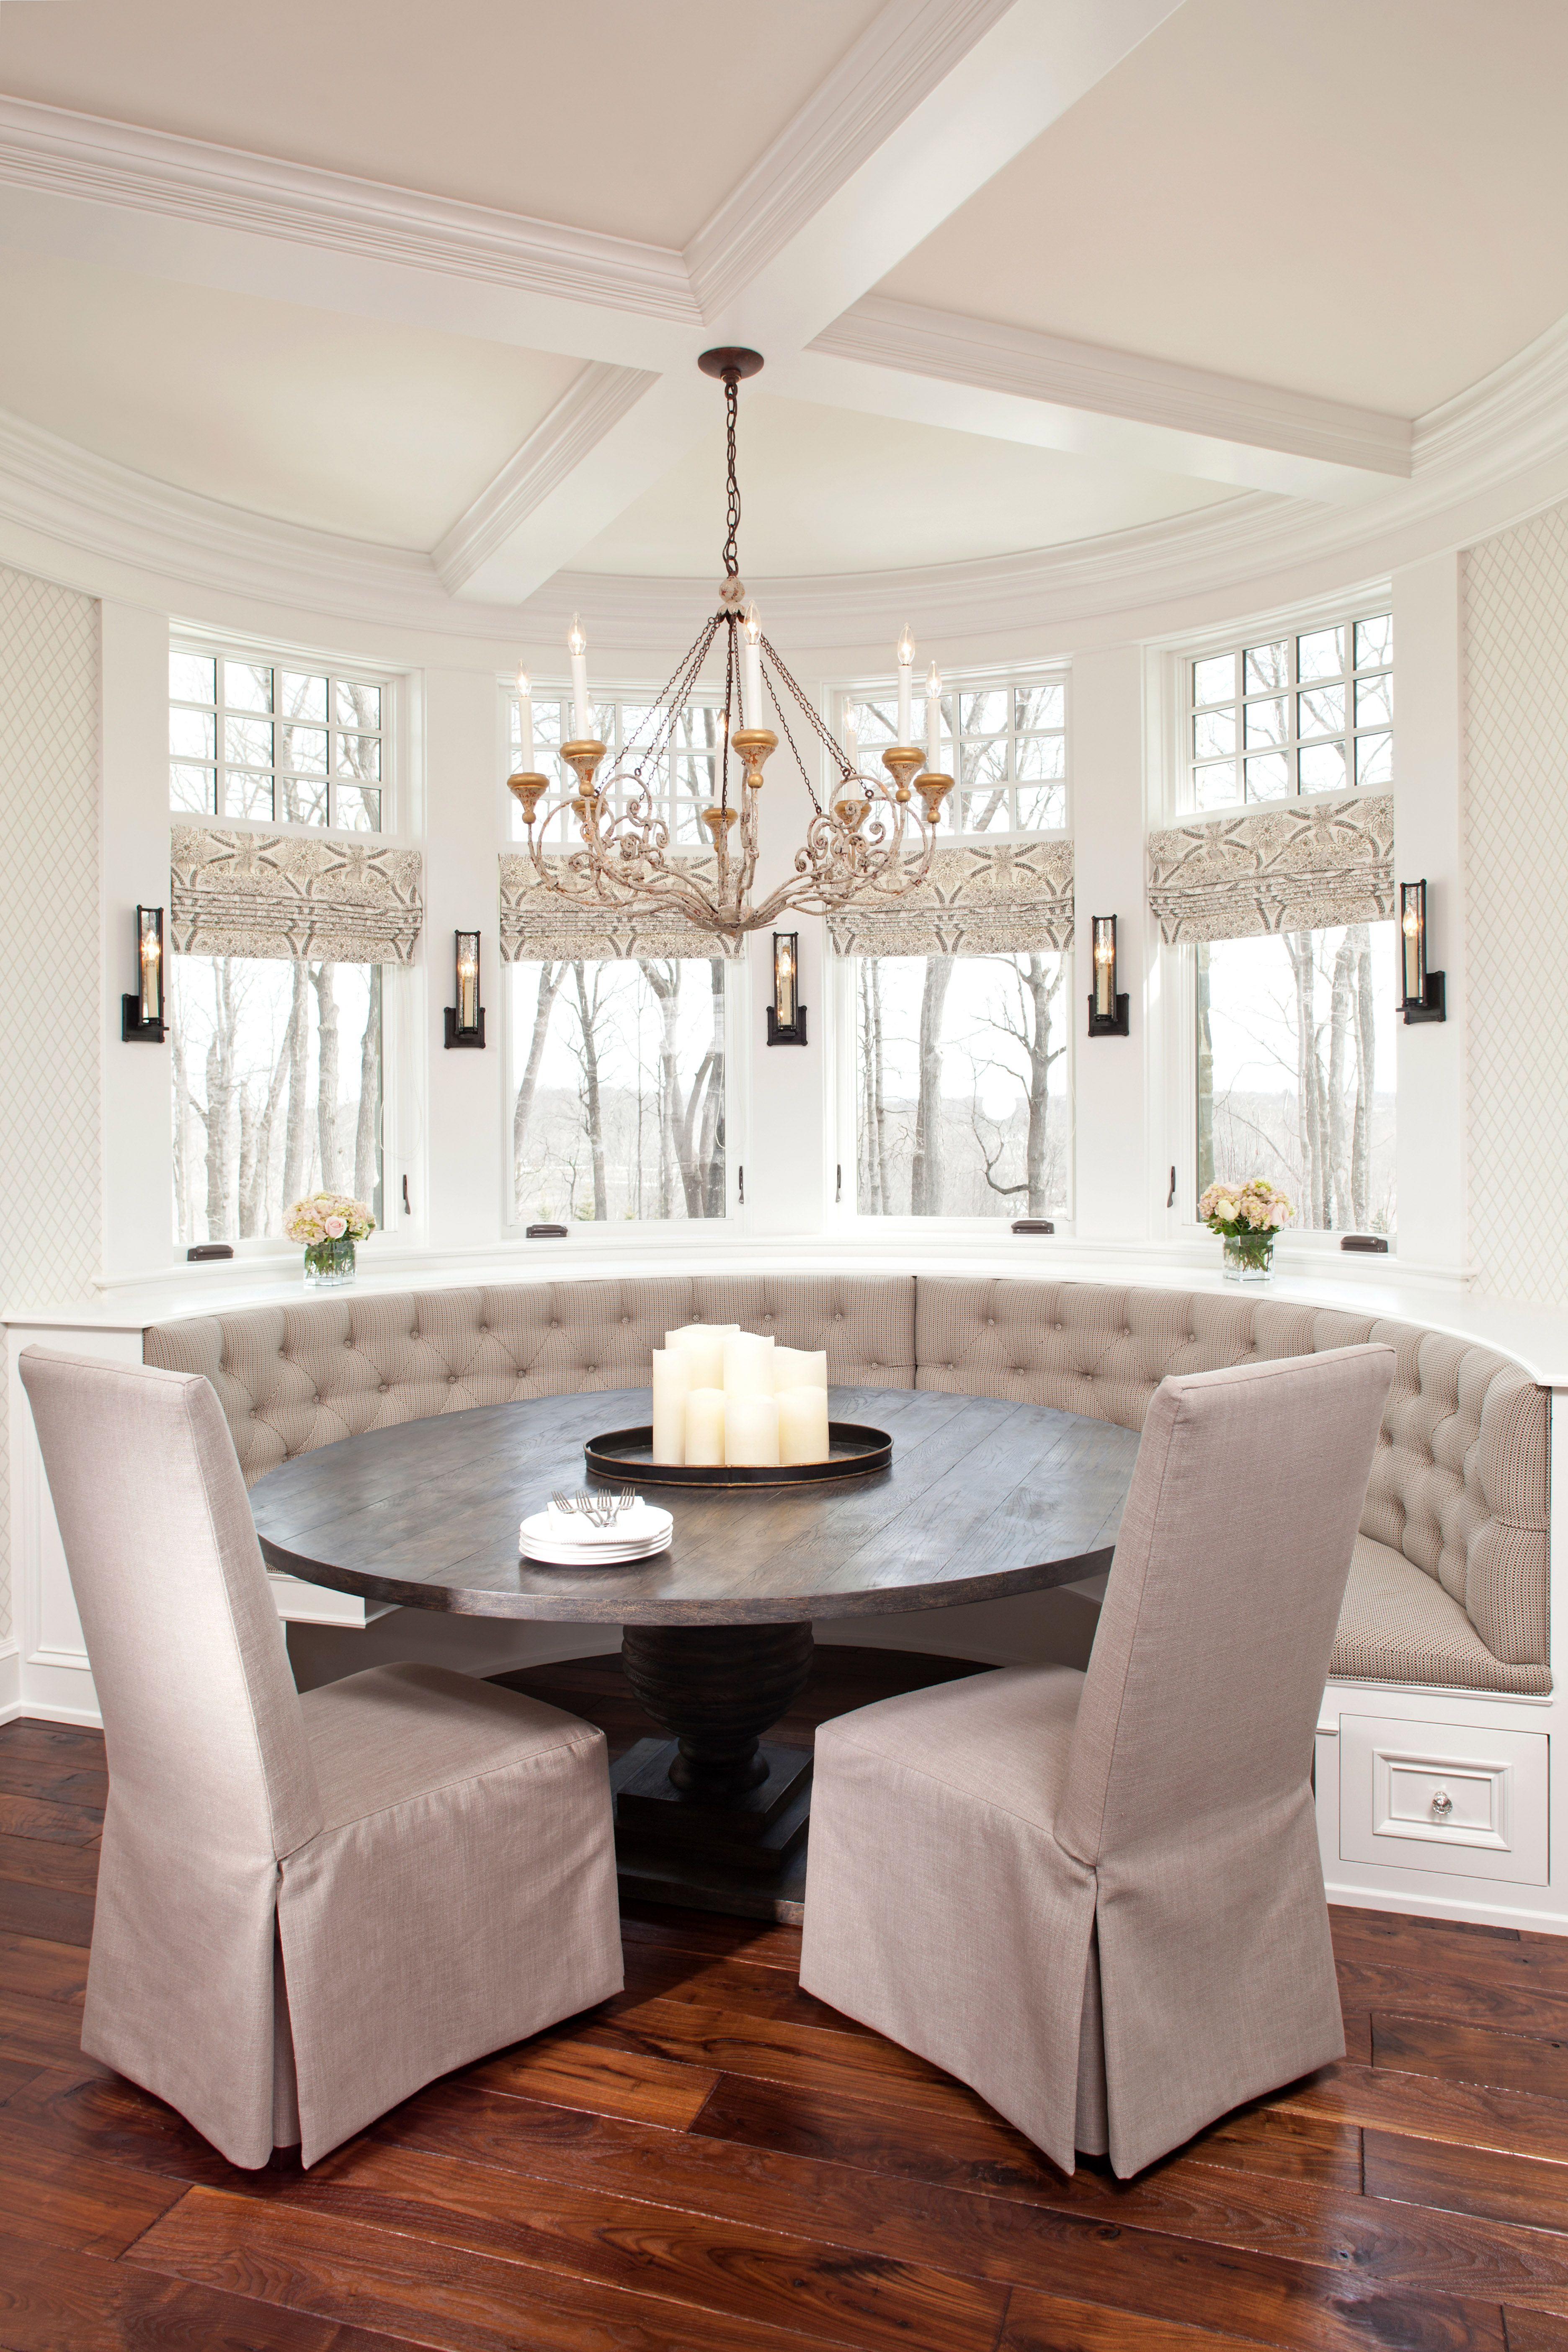 Breakfast Nook - Hamptons in the Country - Eskuche Design - www ...